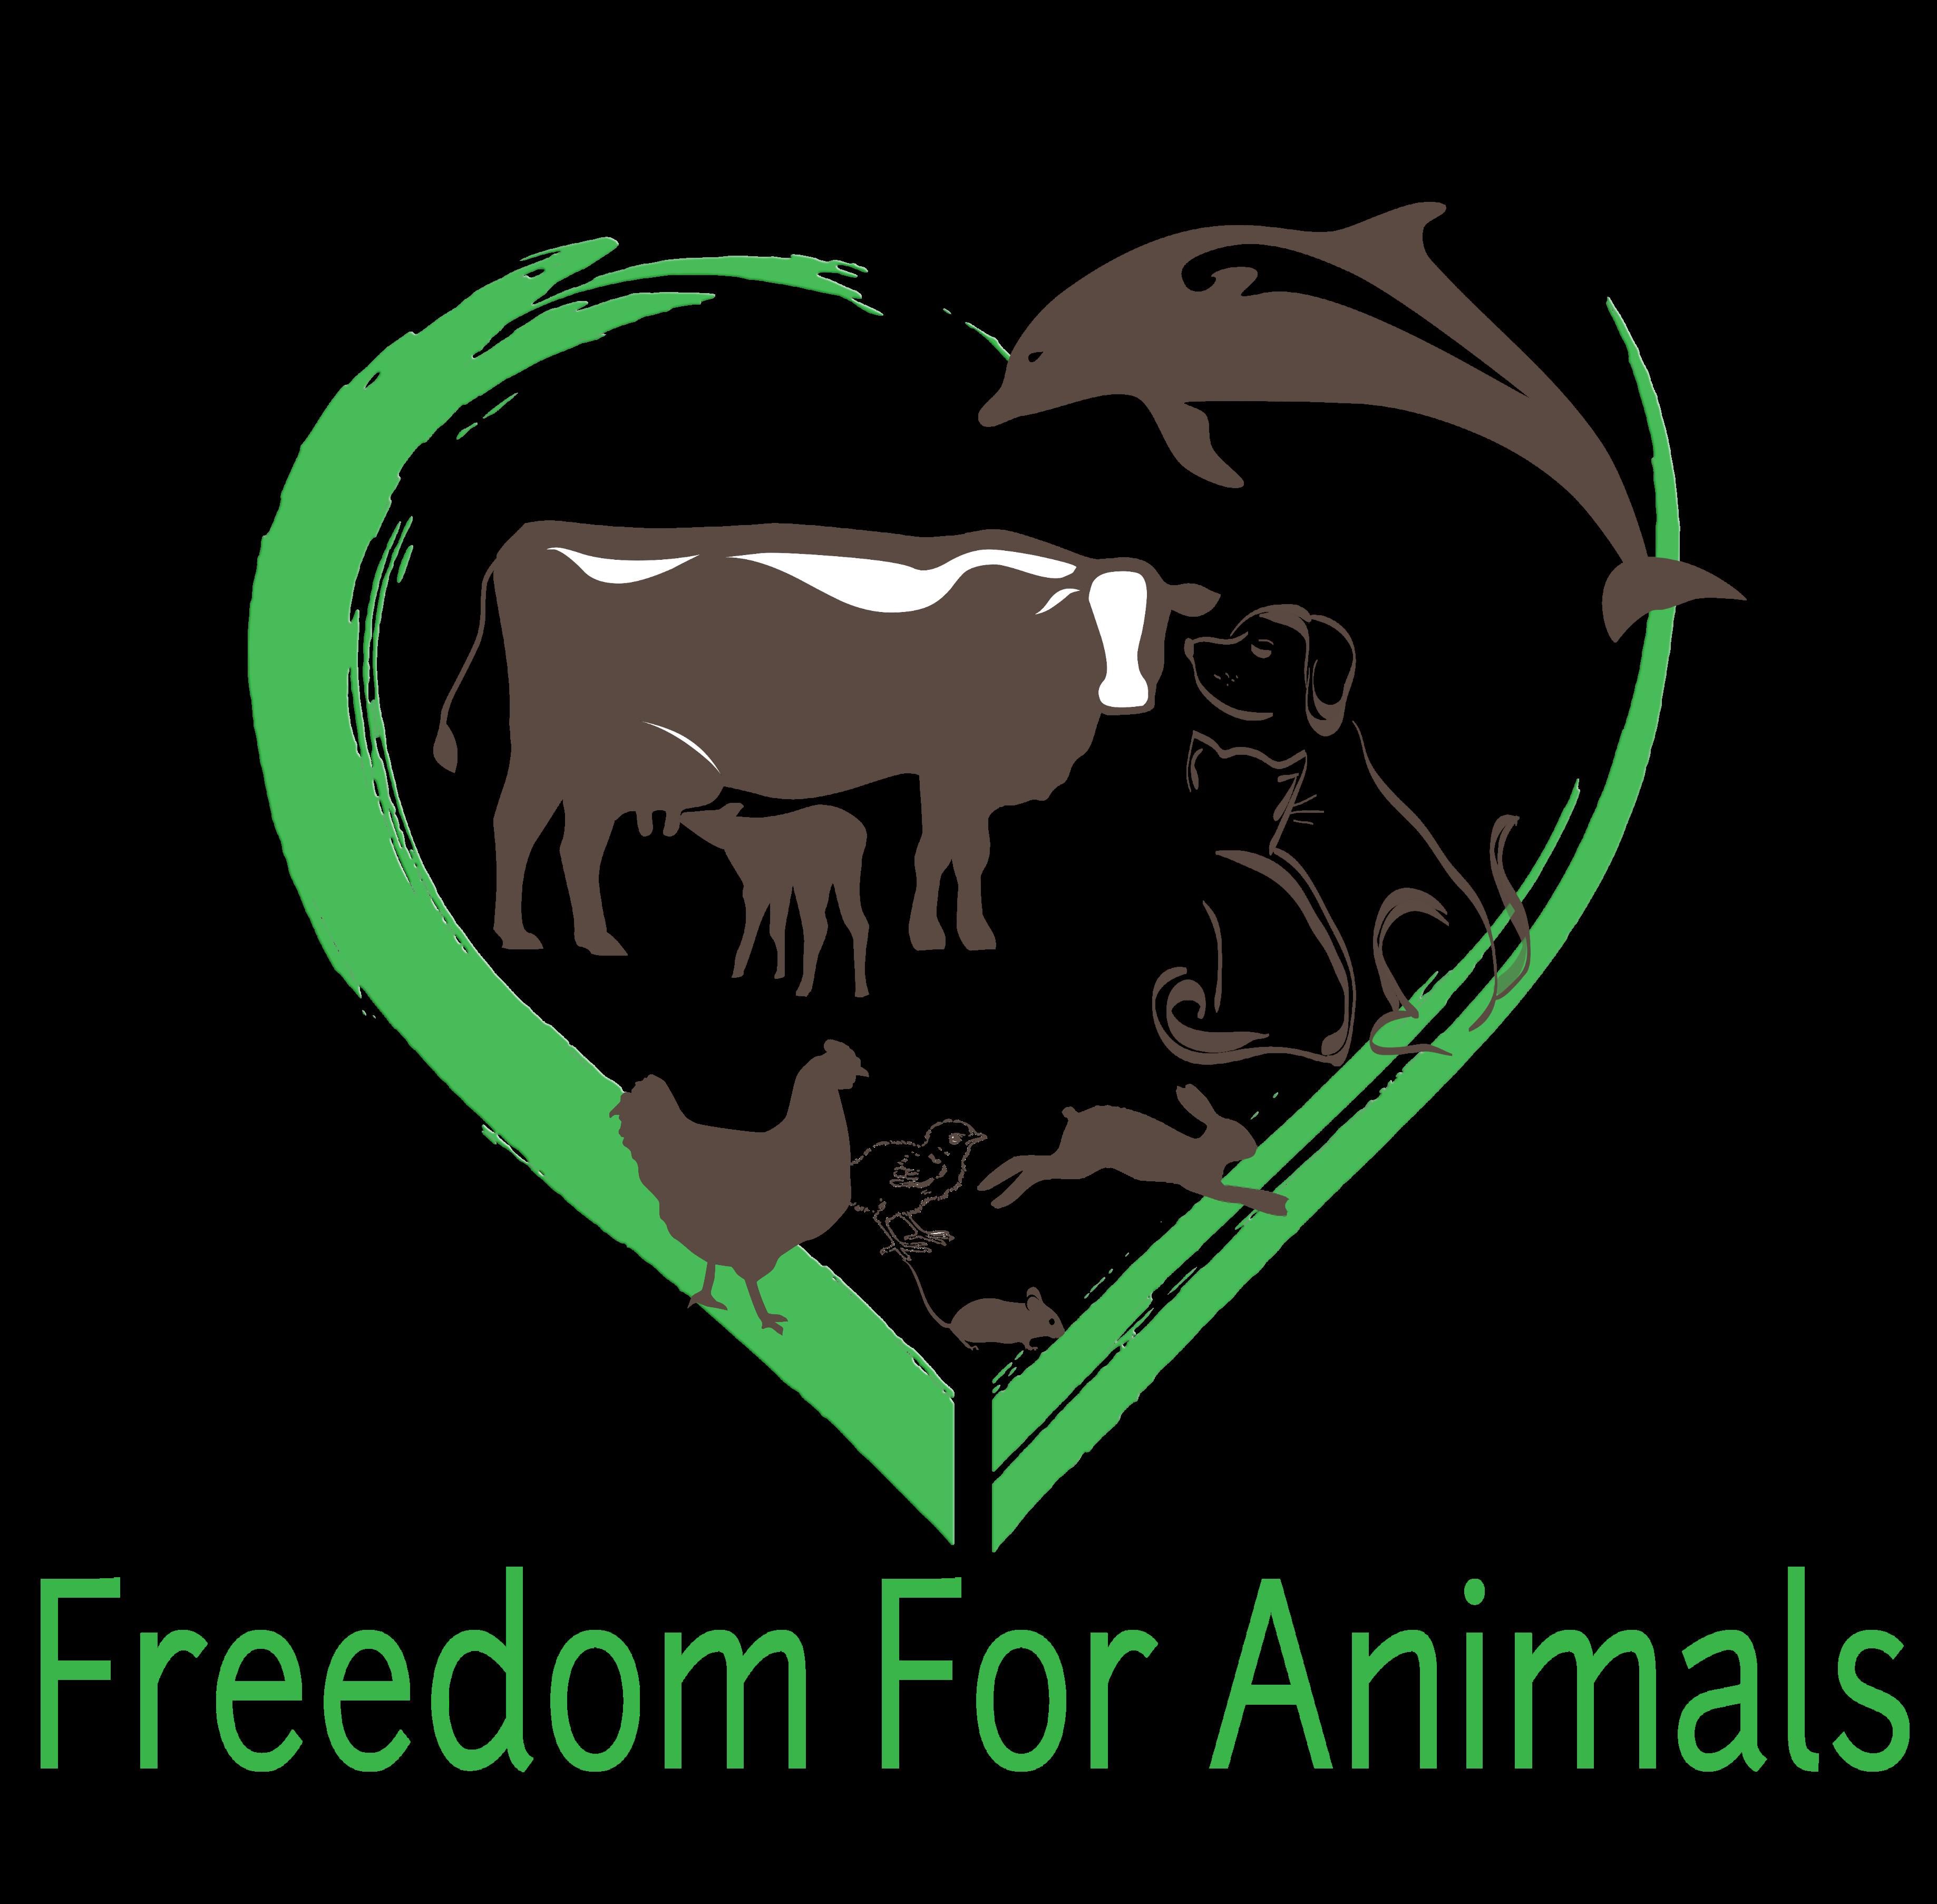 animallogo2 - Israel Against Live Shipments